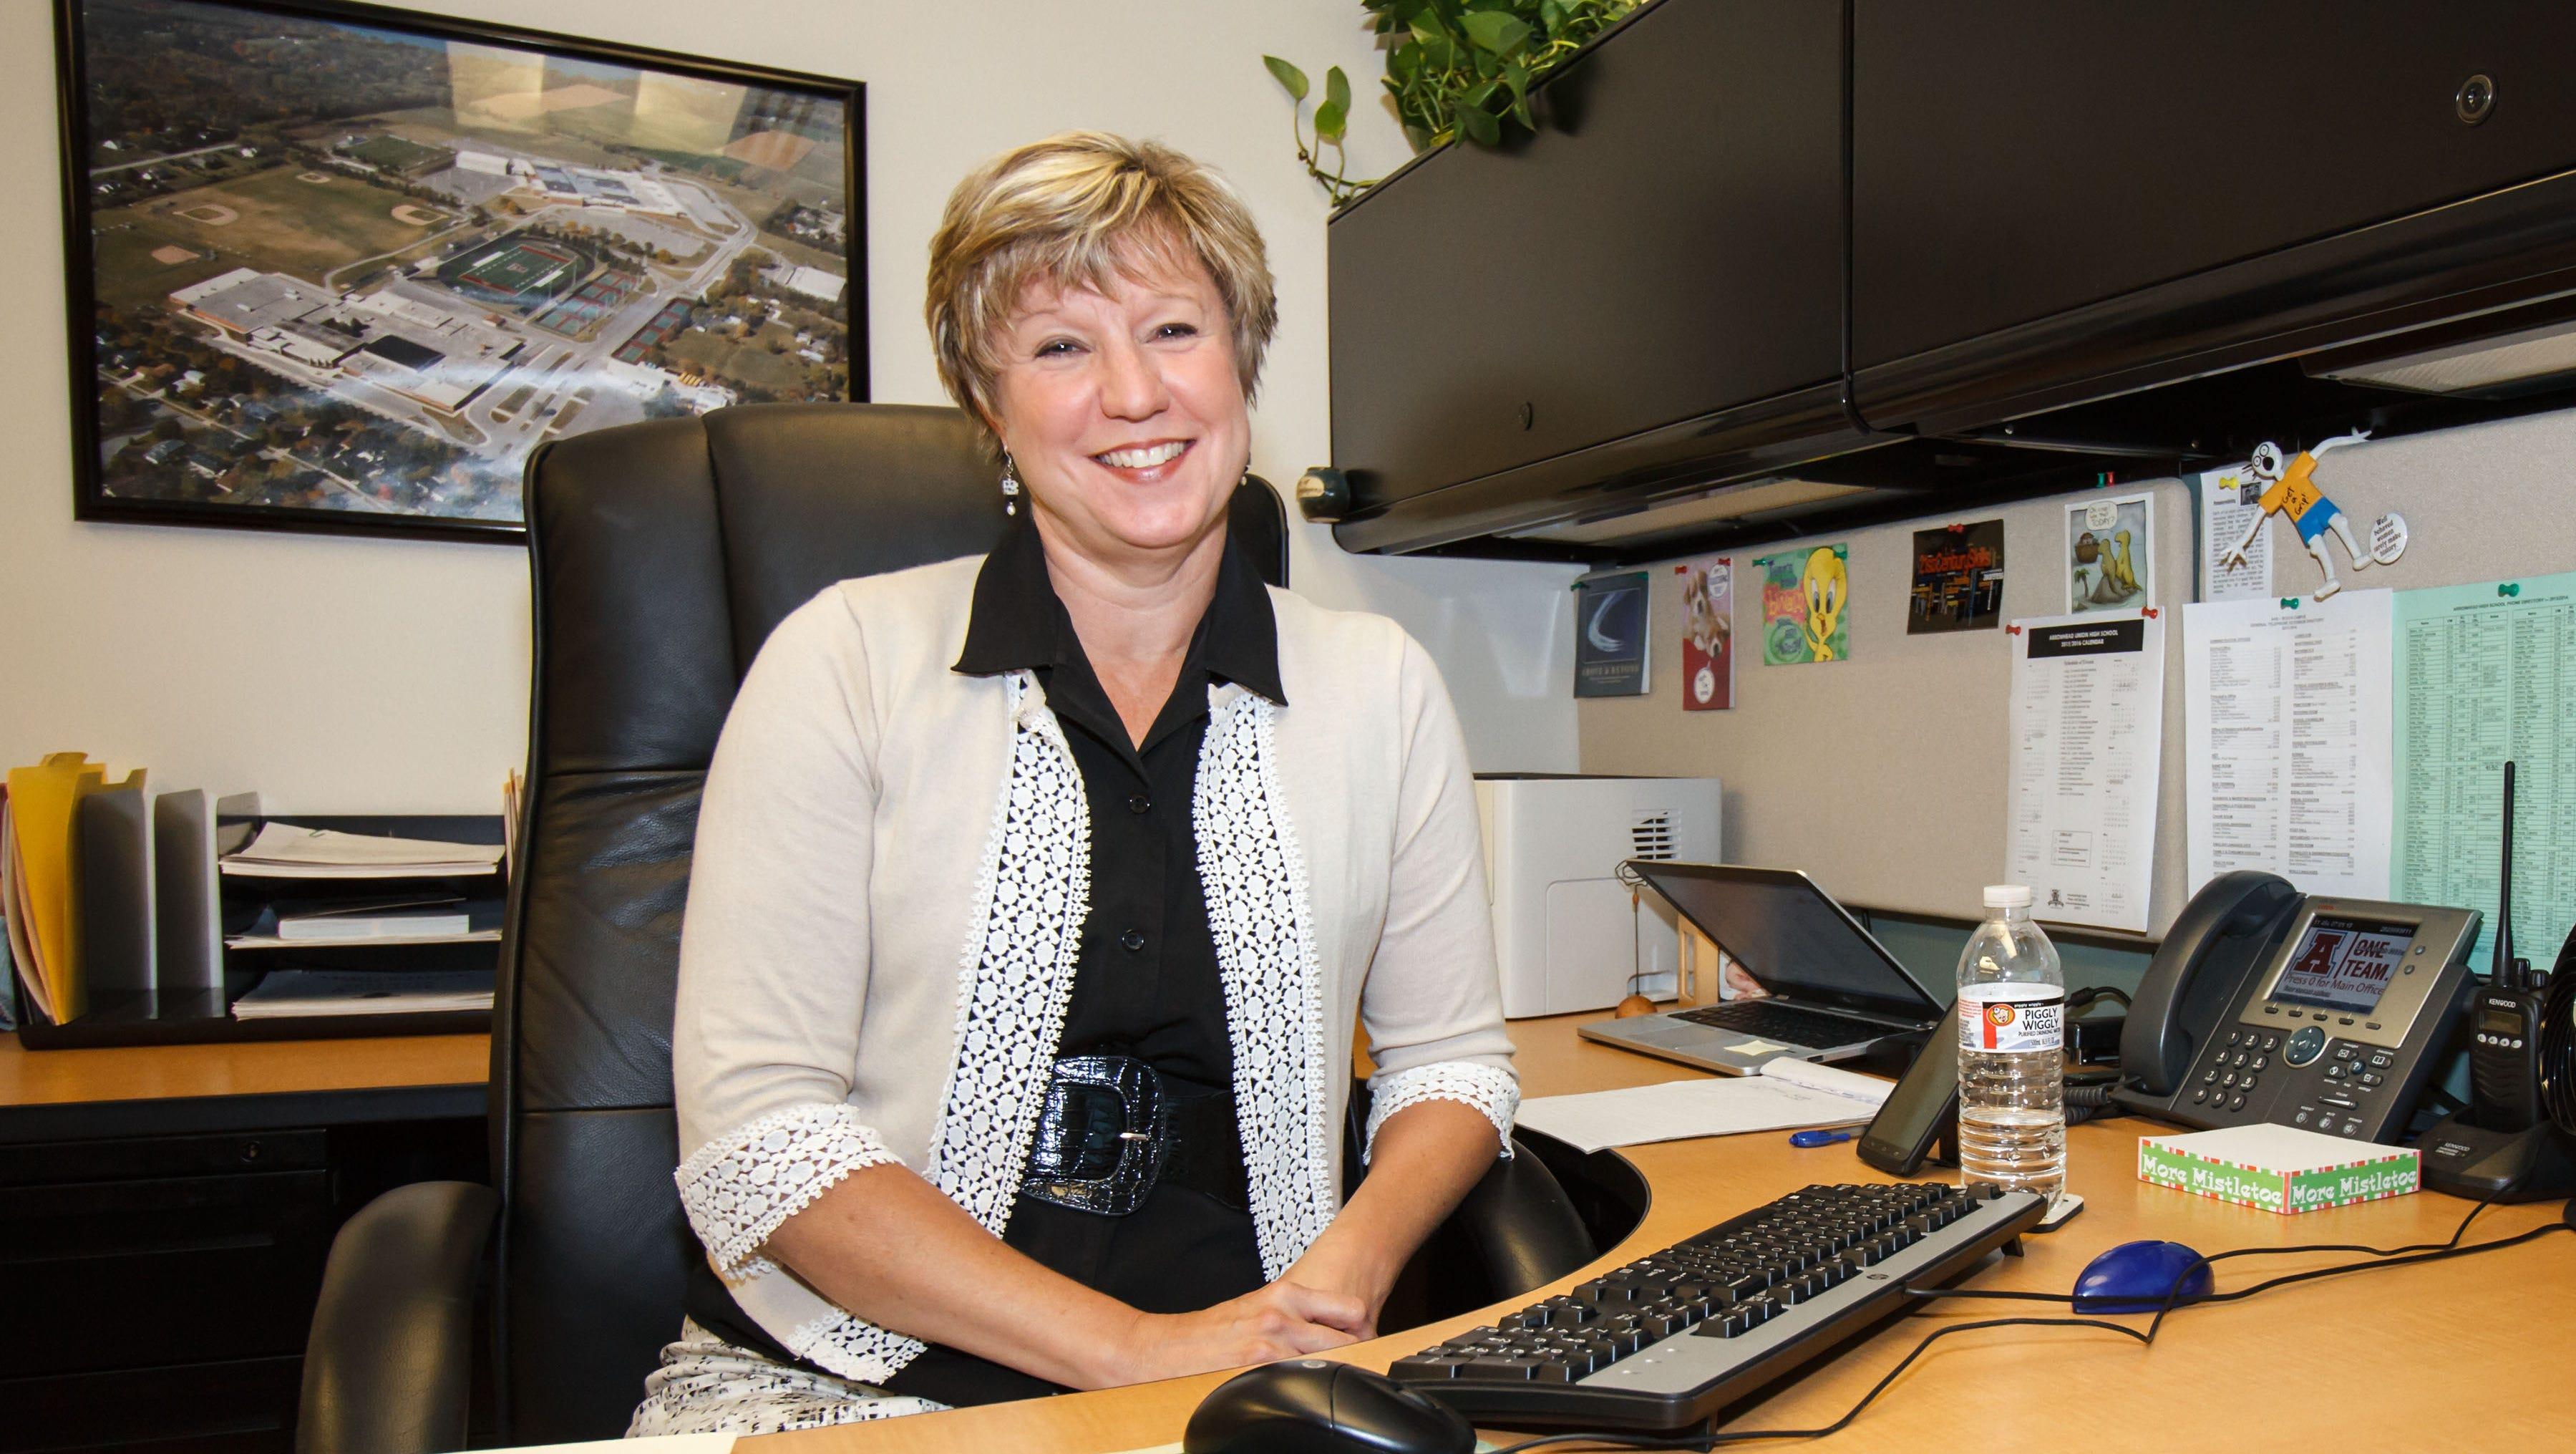 Arrowhead Superintendent Laura Myrah is one of the highest-paid school superintendents in the Milwaukee suburbs.